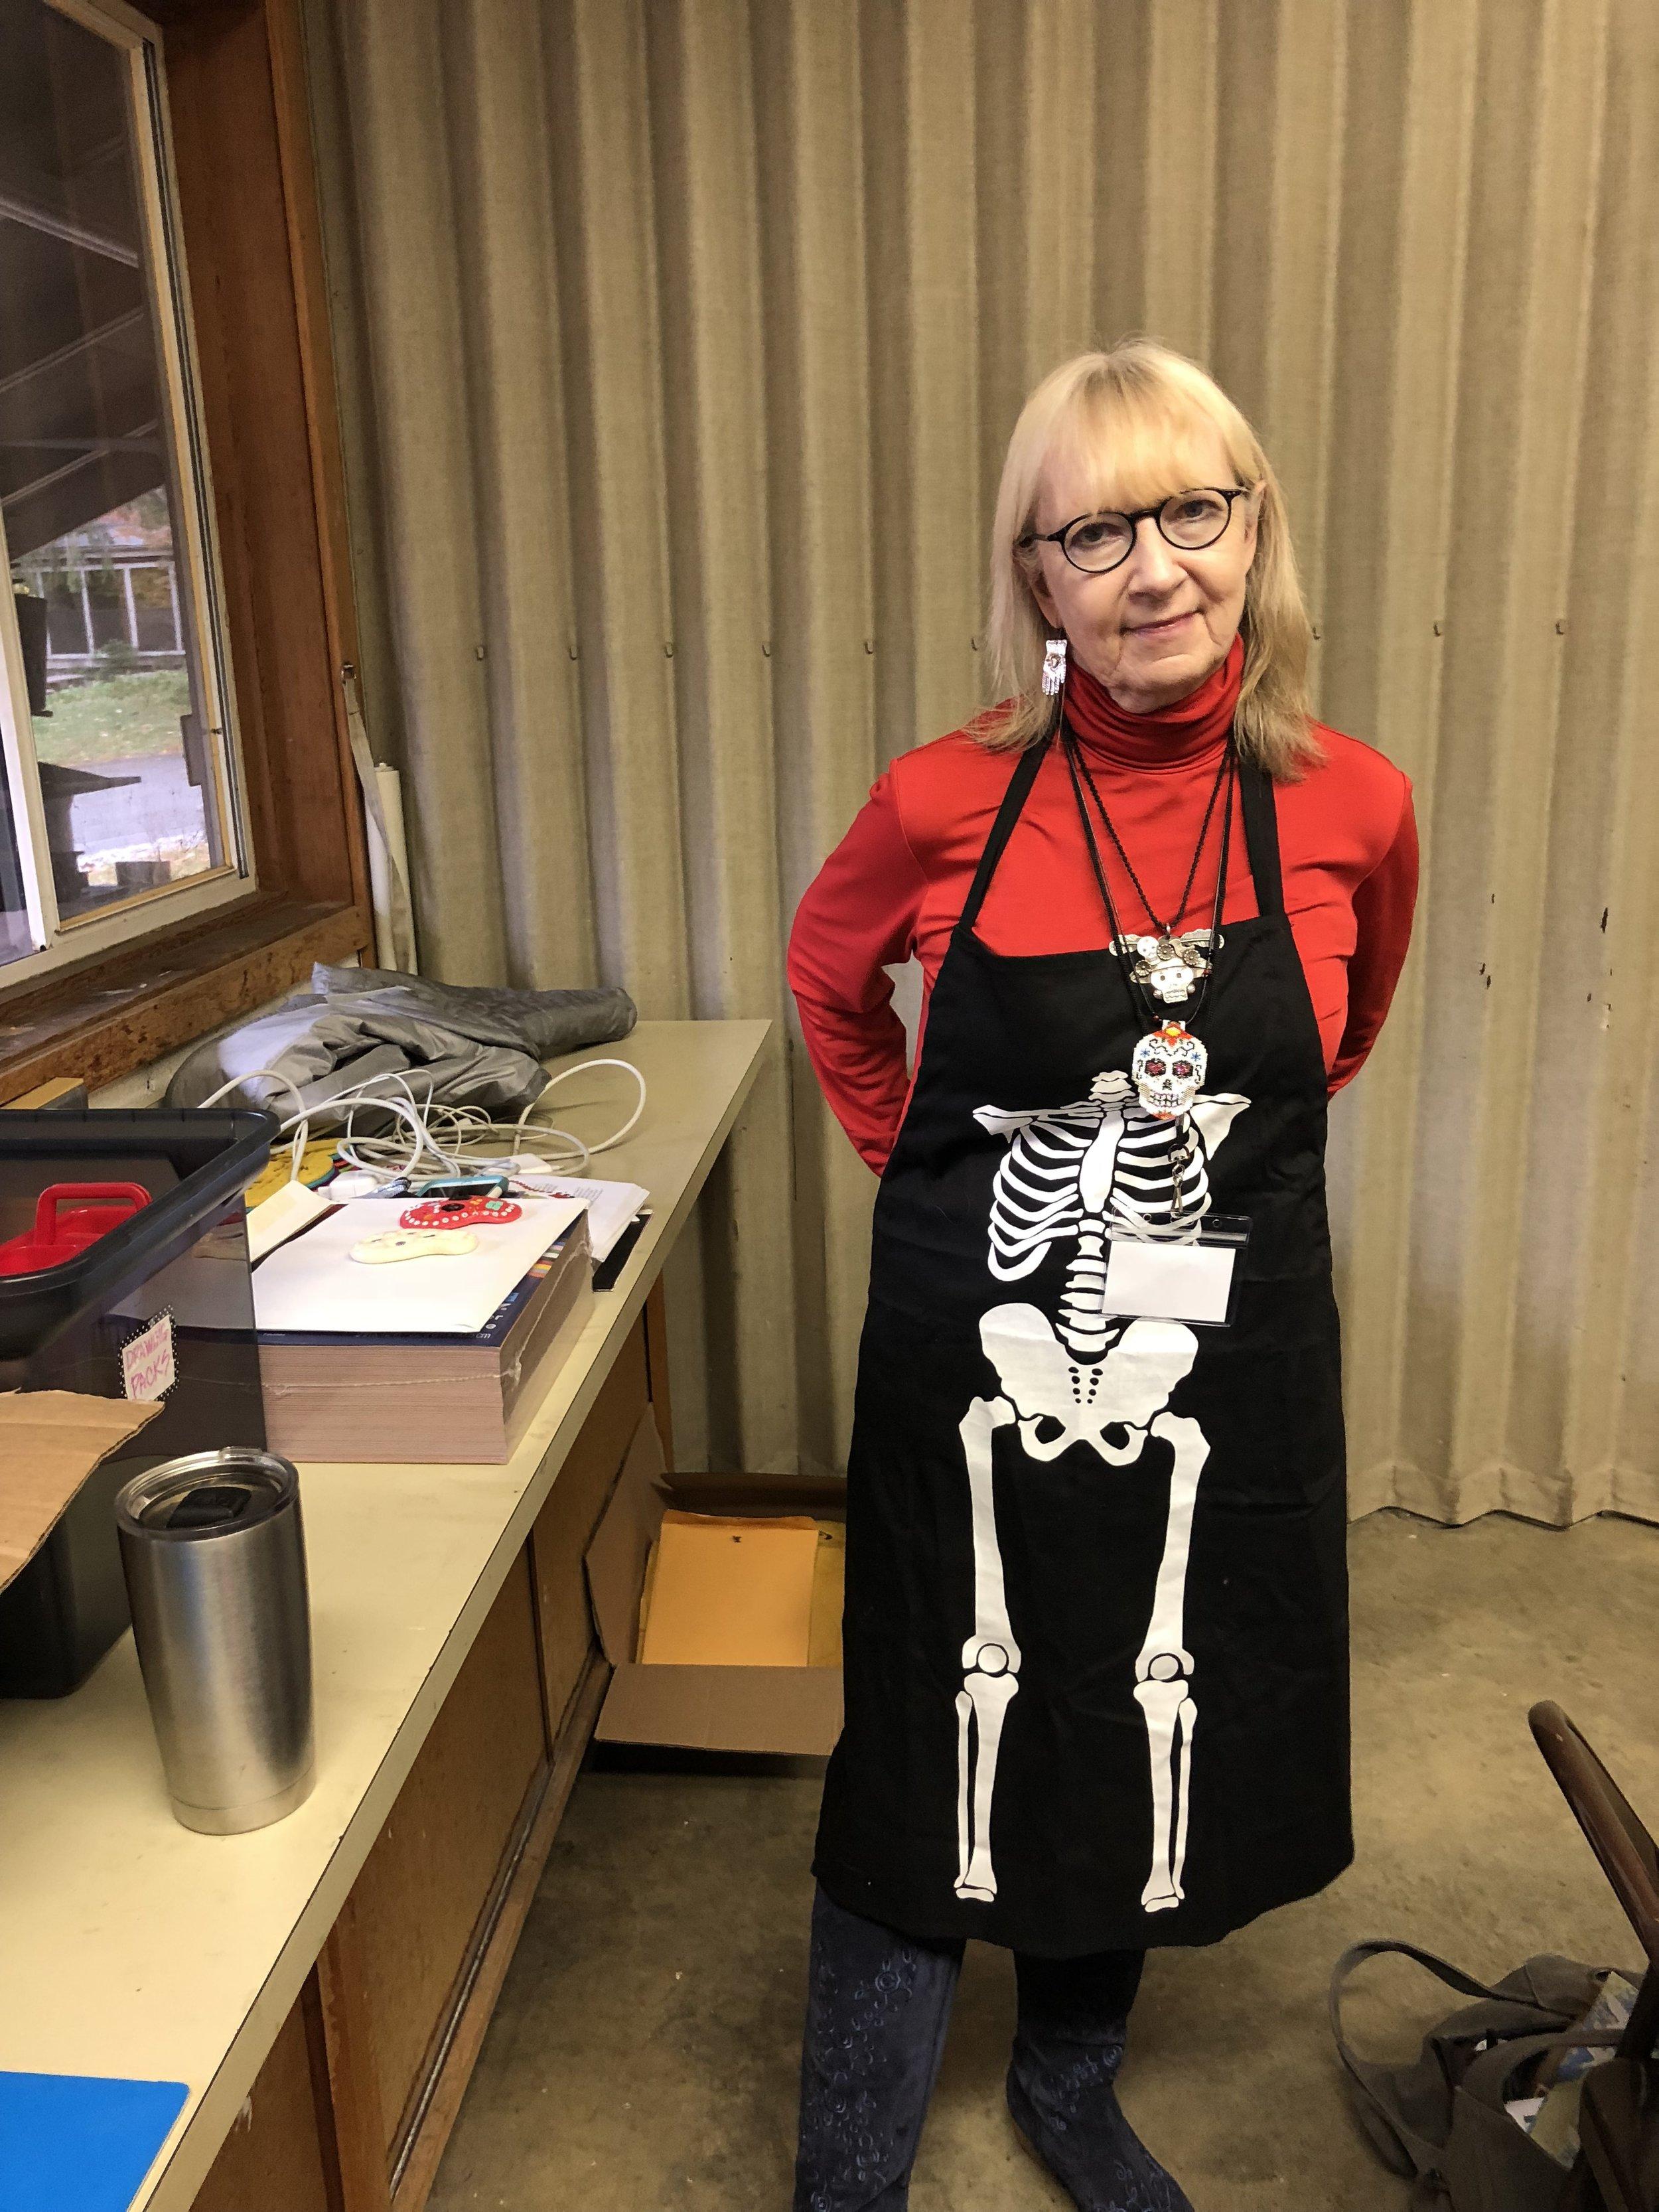 Workshops_Nancy Walkup Presenting a Day of the Dead Workshop.JPG